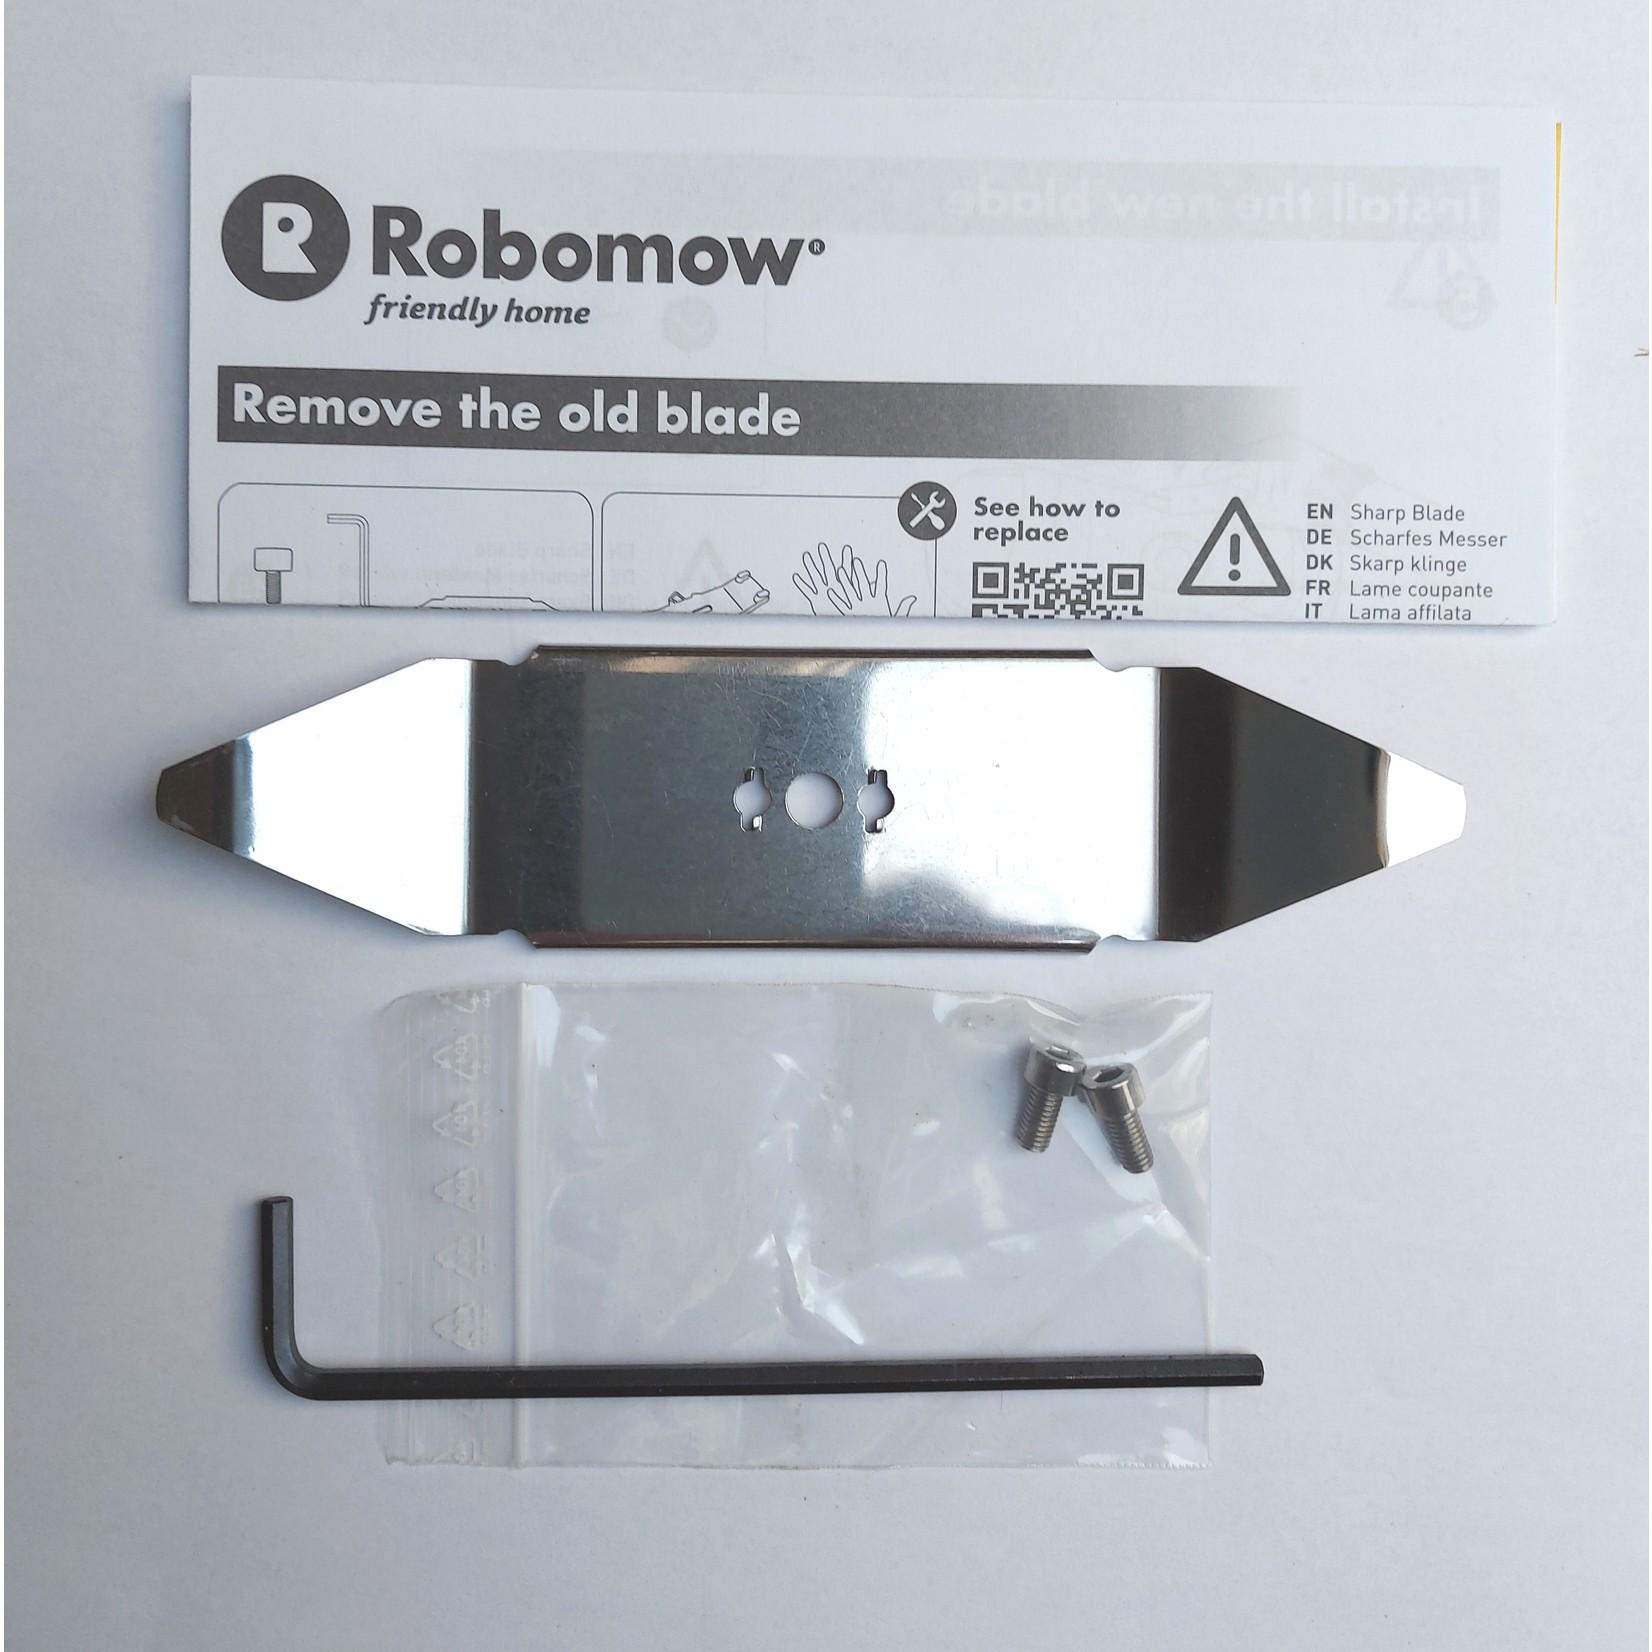 Robomow Original Robomow 122-102-619 Ersatzmesser für RT Modelle Original